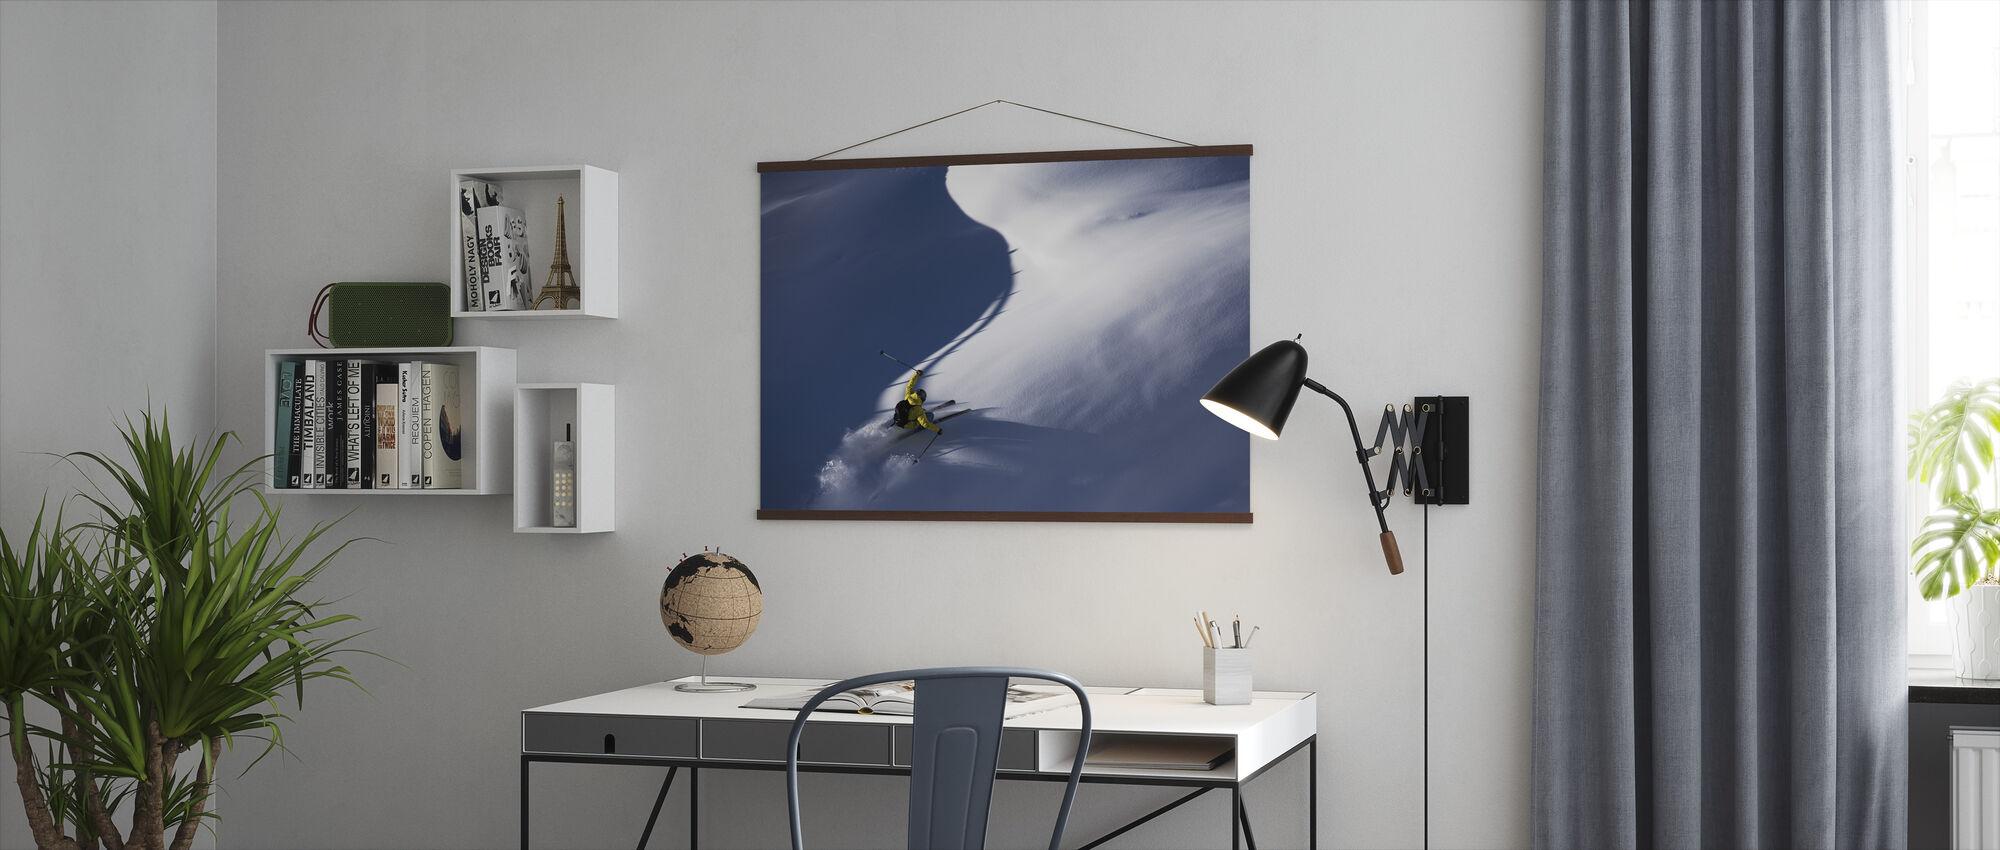 Pulver Snö Skidåkning - Poster - Kontor